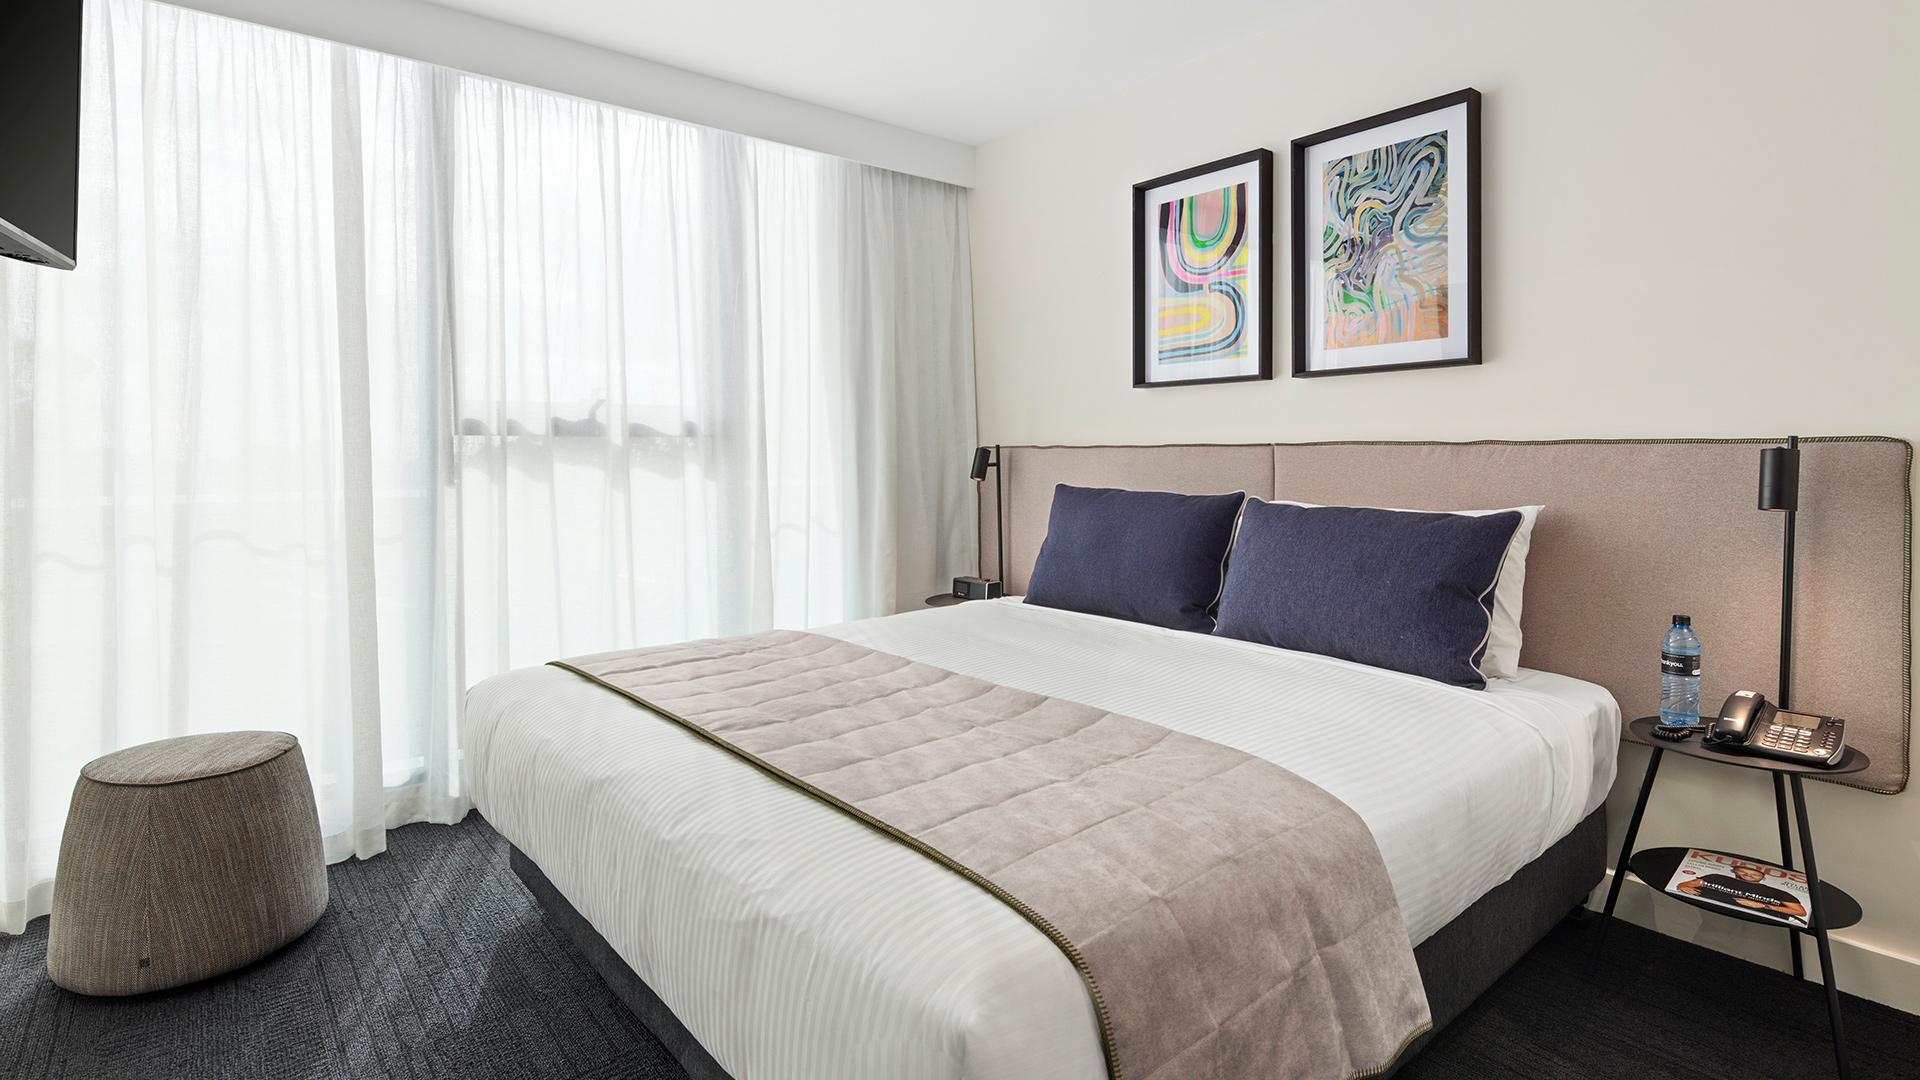 Two-Bedroom Apartment image 1 at Quest St Kilda Road by Port Phillip City, Victoria, Australia